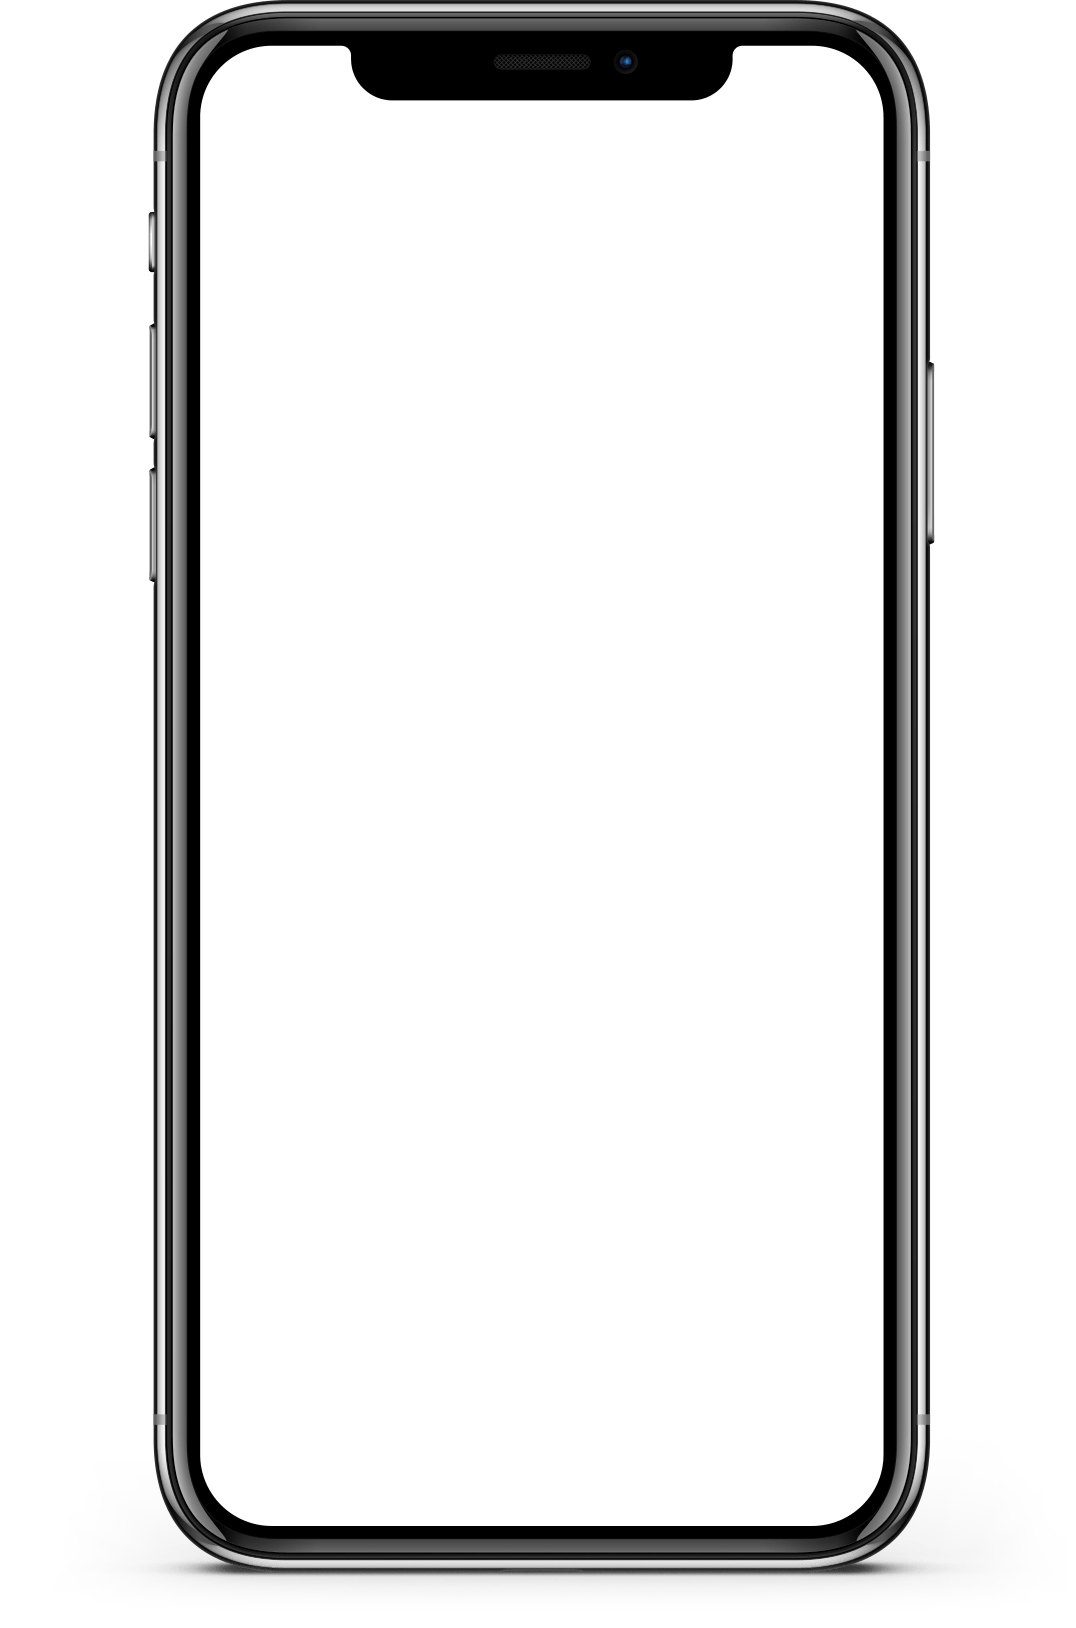 Iphone X Screen Mockup transparent PNG , StickPNG